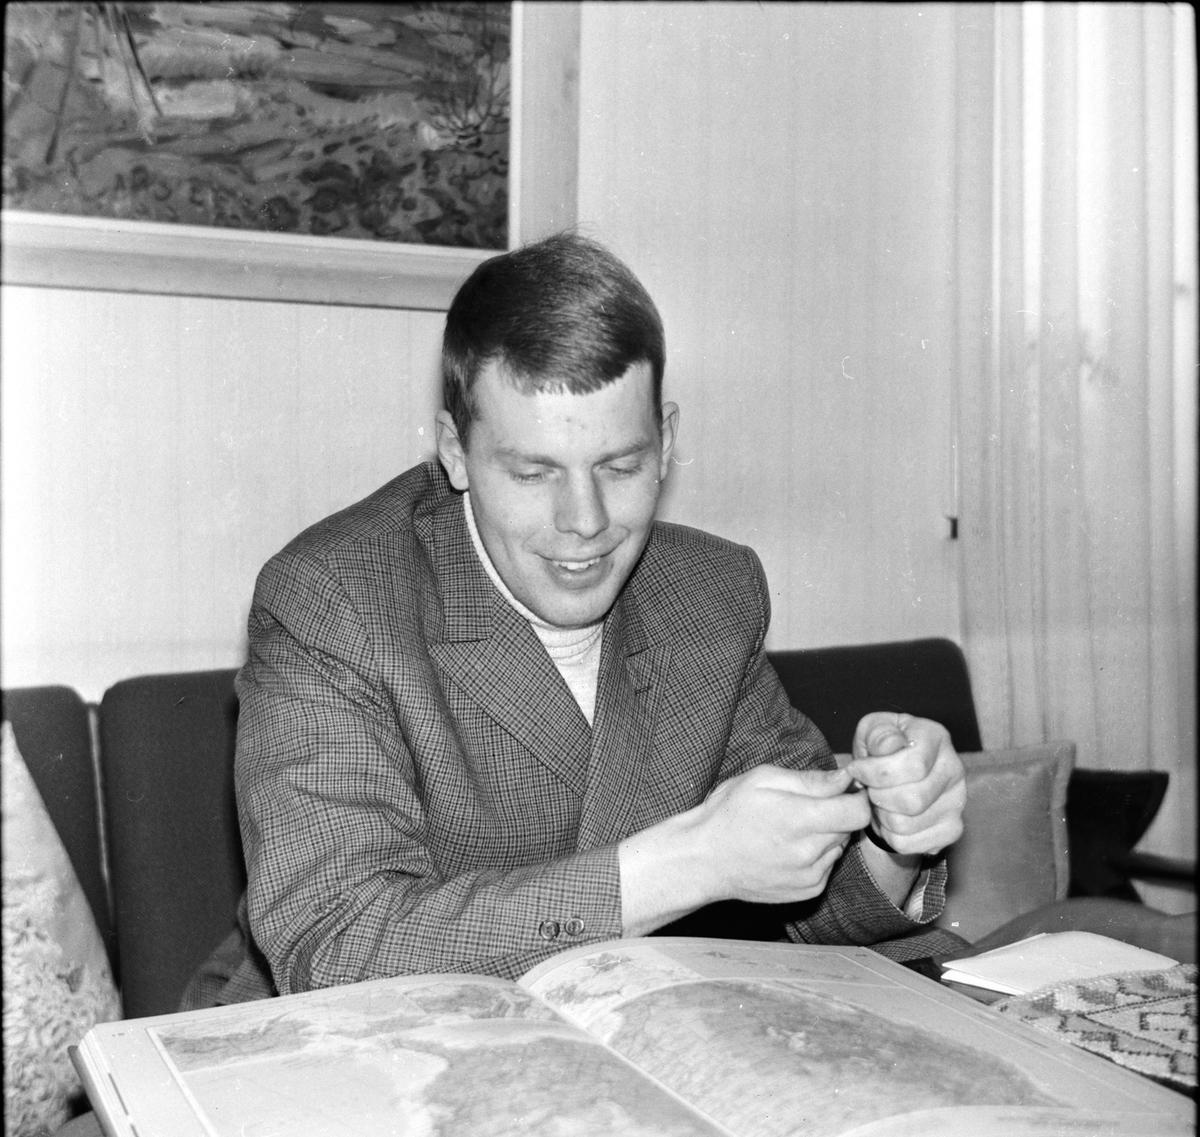 Nytorp, Erik Persson reser till USA, 18 Mars 1968